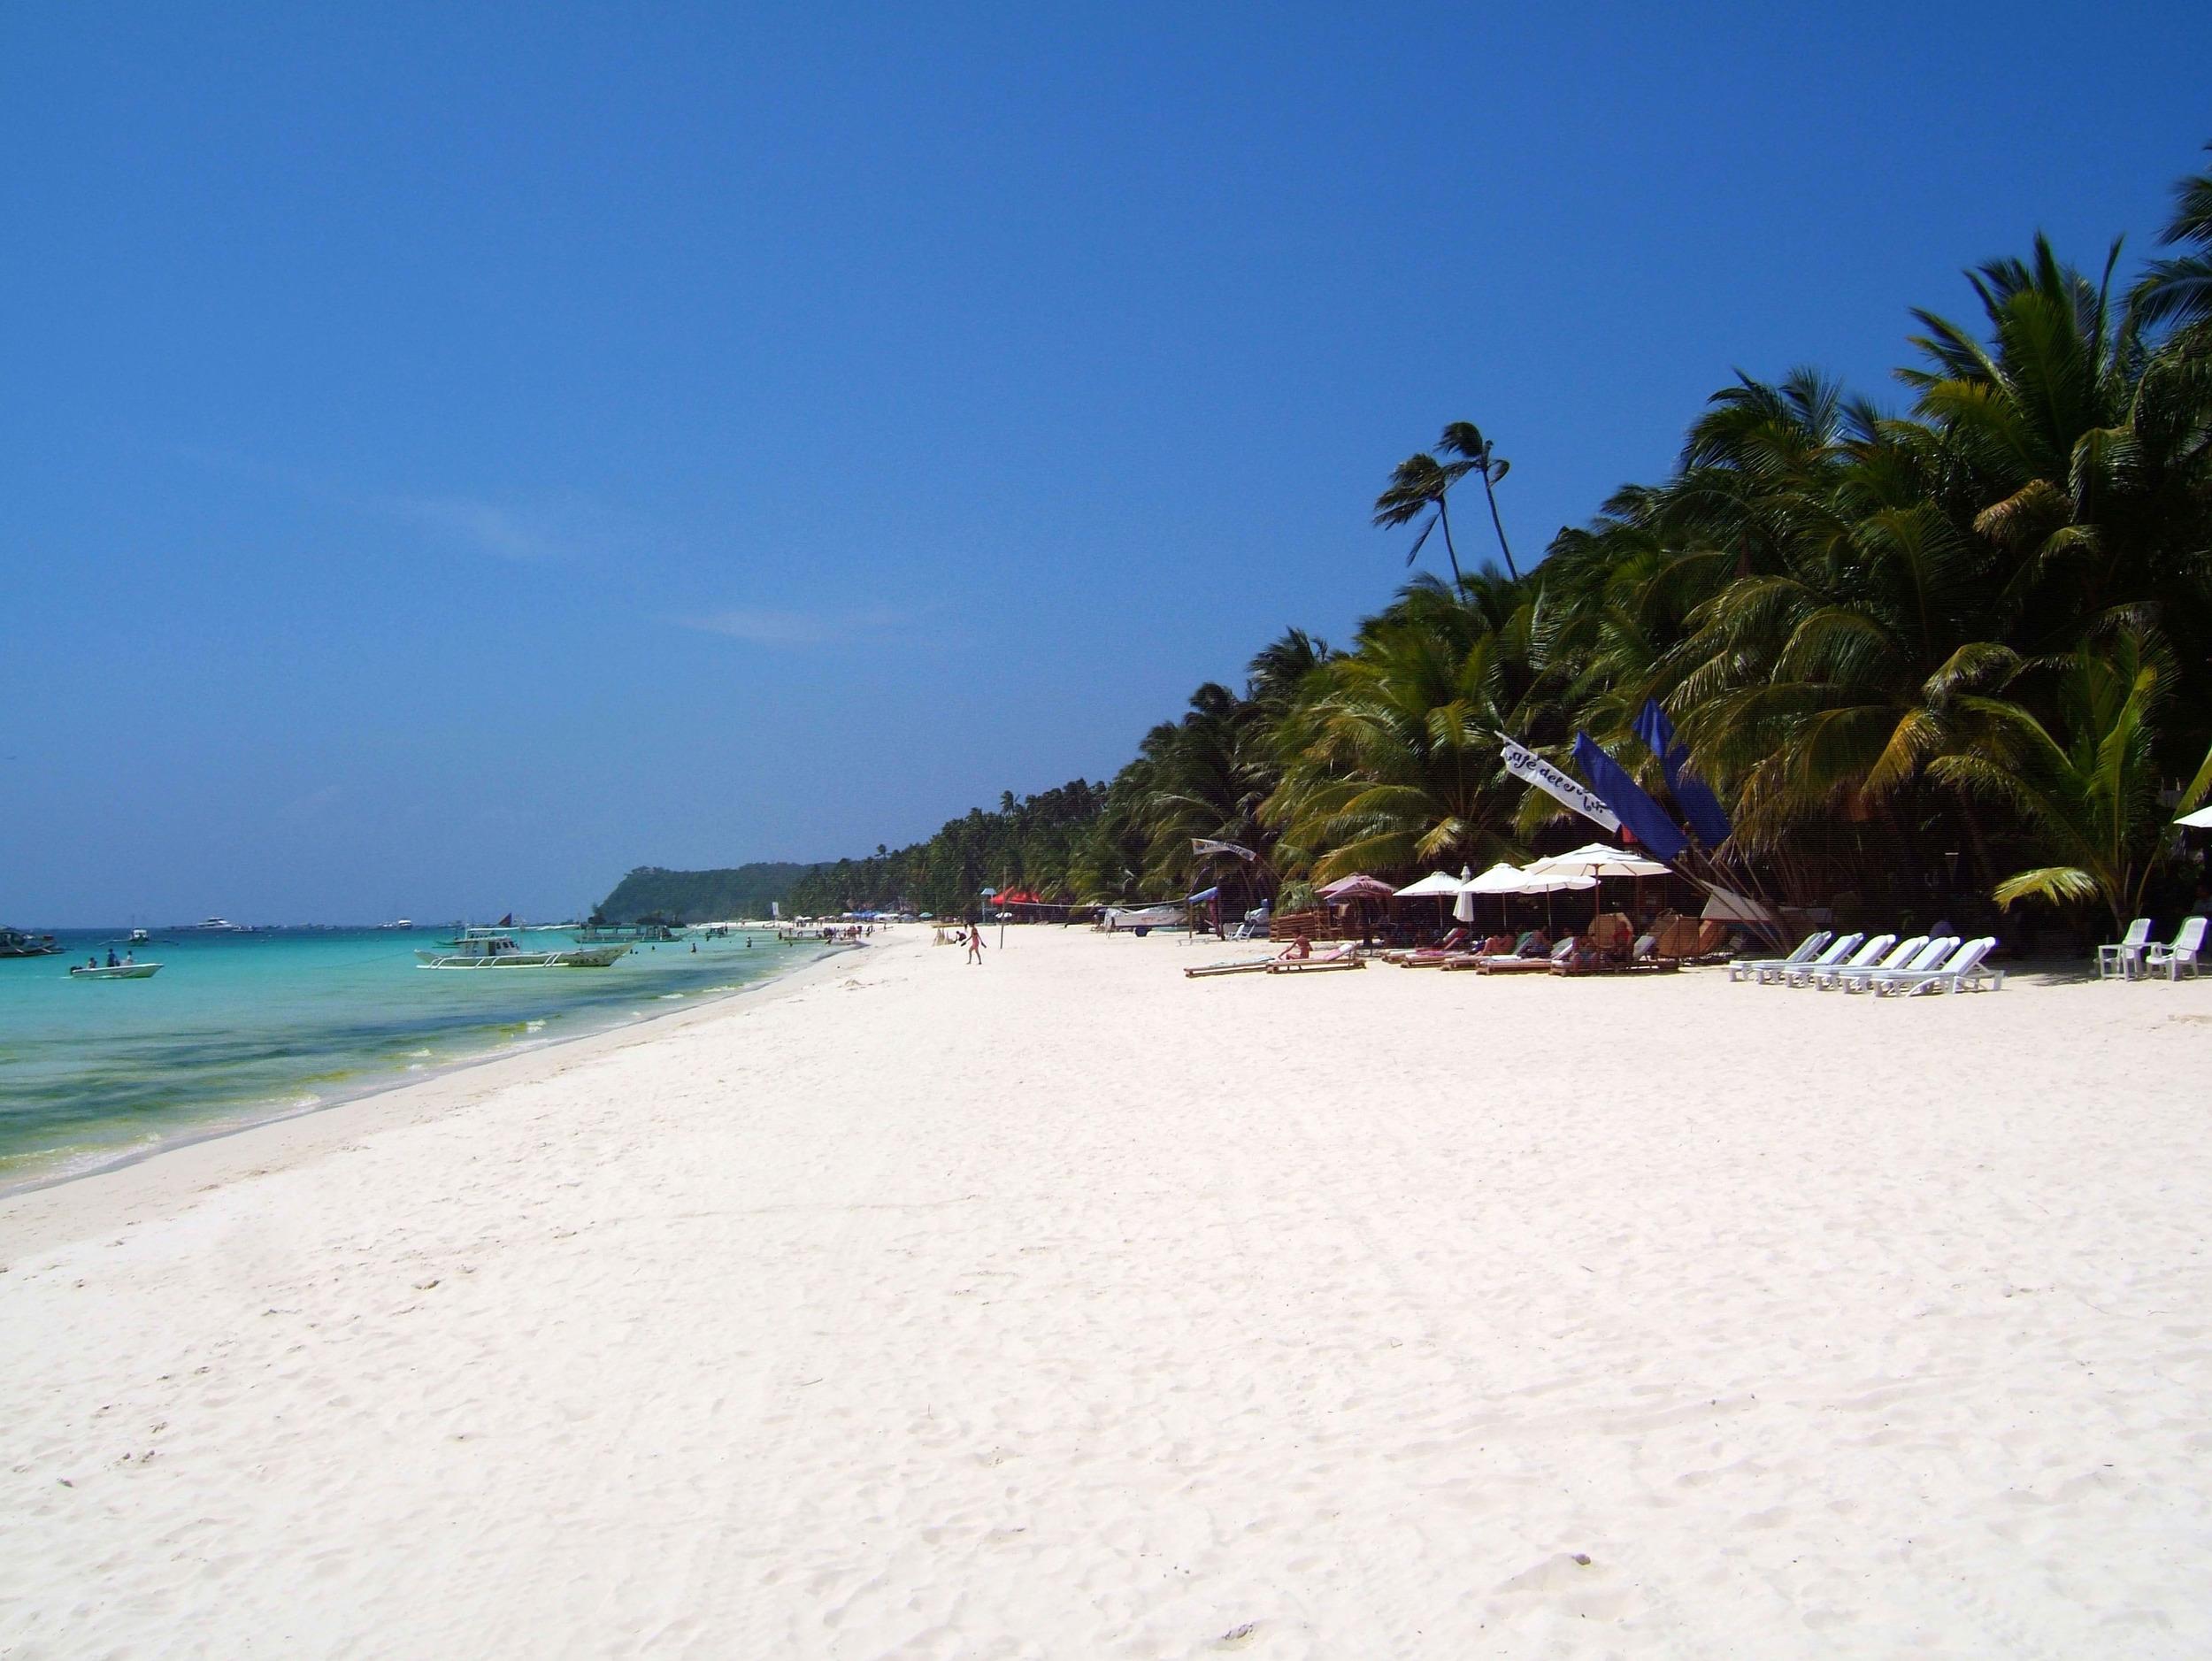 Philippines-Sugar-Islands-Caticlan-Boracay-White-Beach-Apr-2006-29.jpg